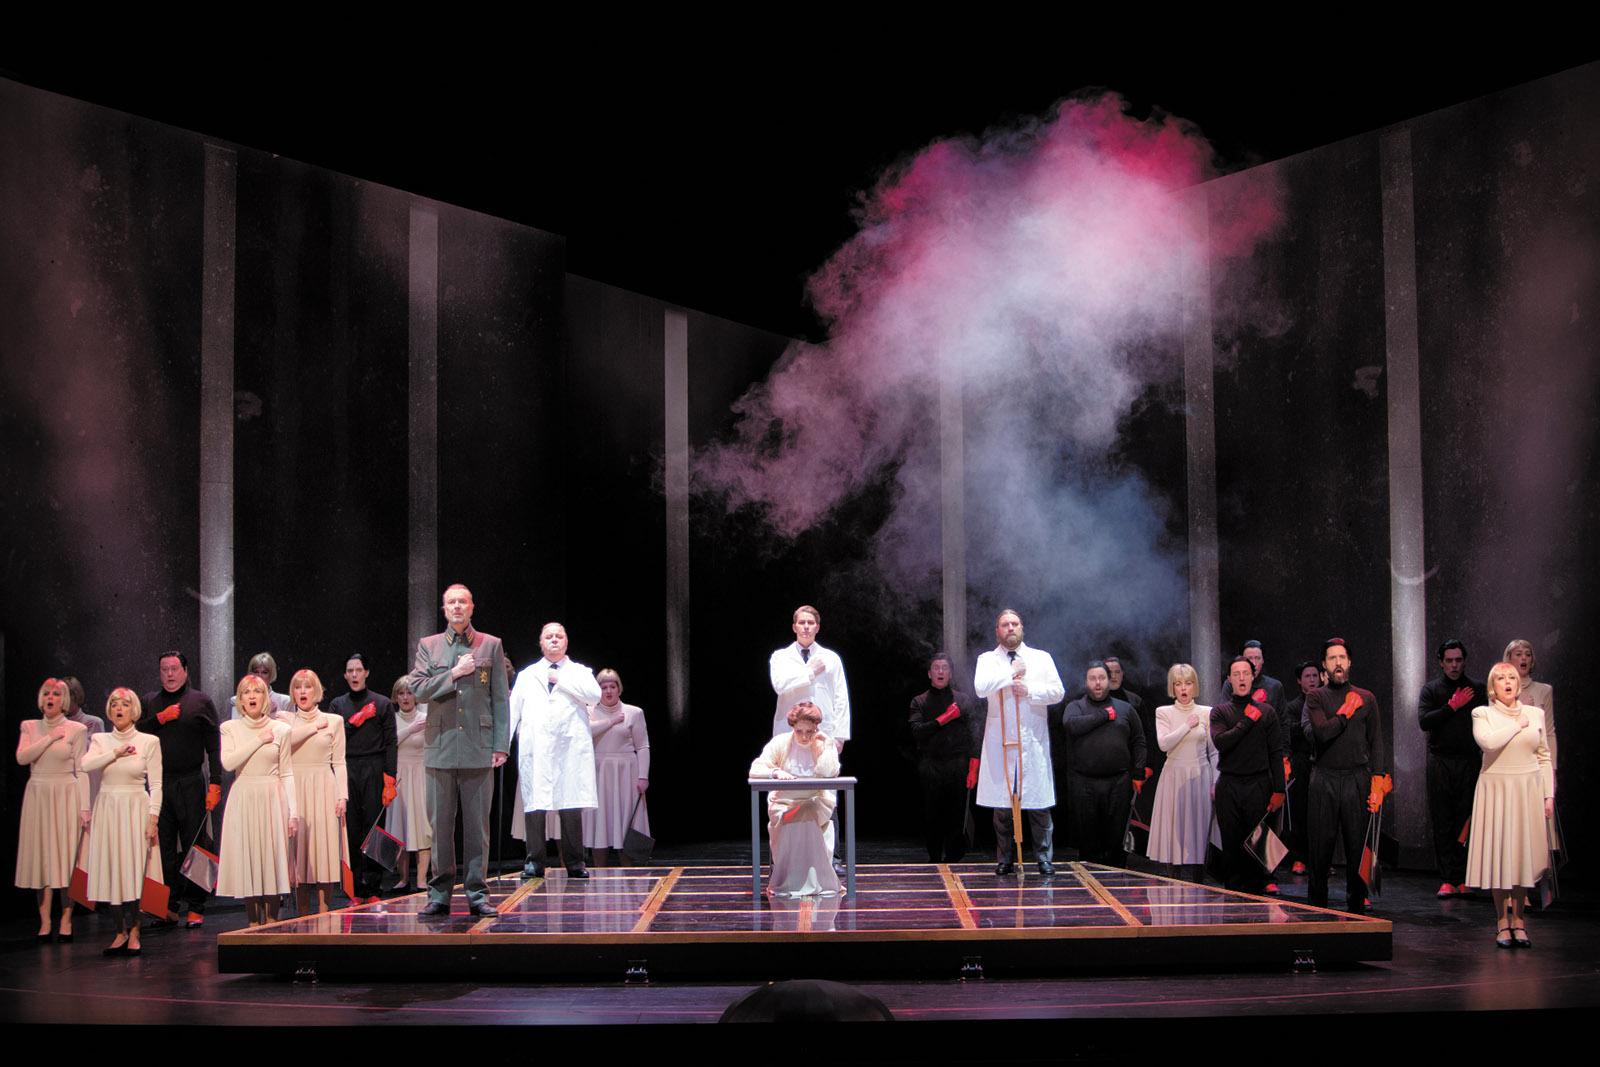 A scene from the opera Aniara